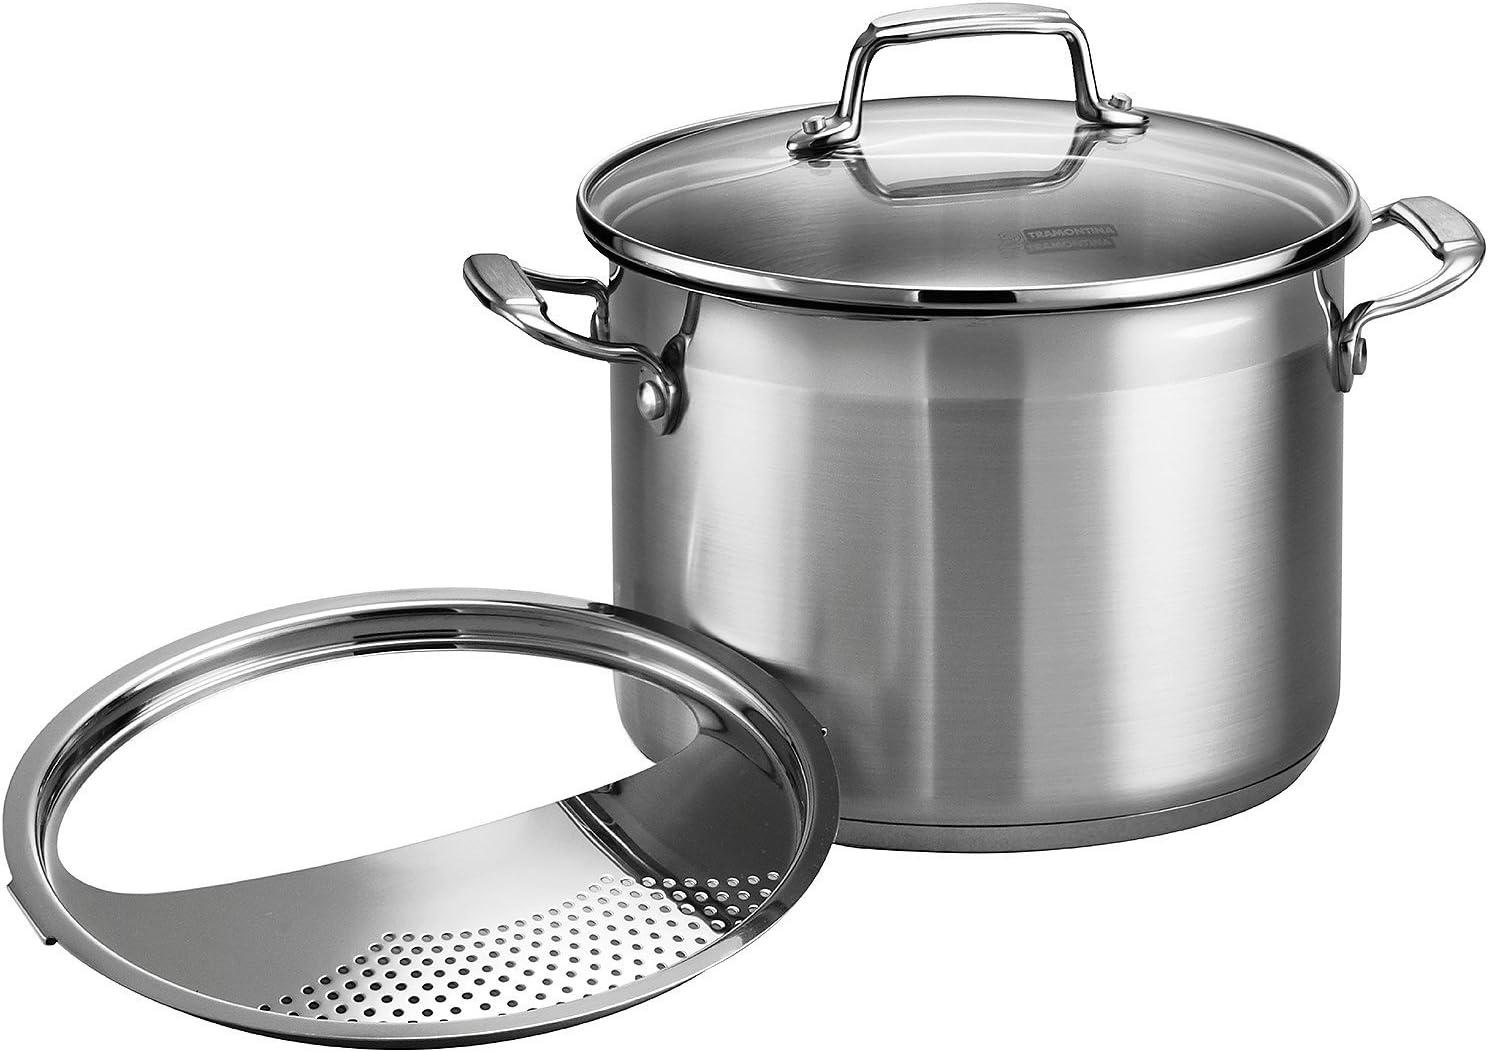 Tramontina 80120/200DS Gourmet Stainless Steel Pasta Cooker, 3-Piece 6-Quart